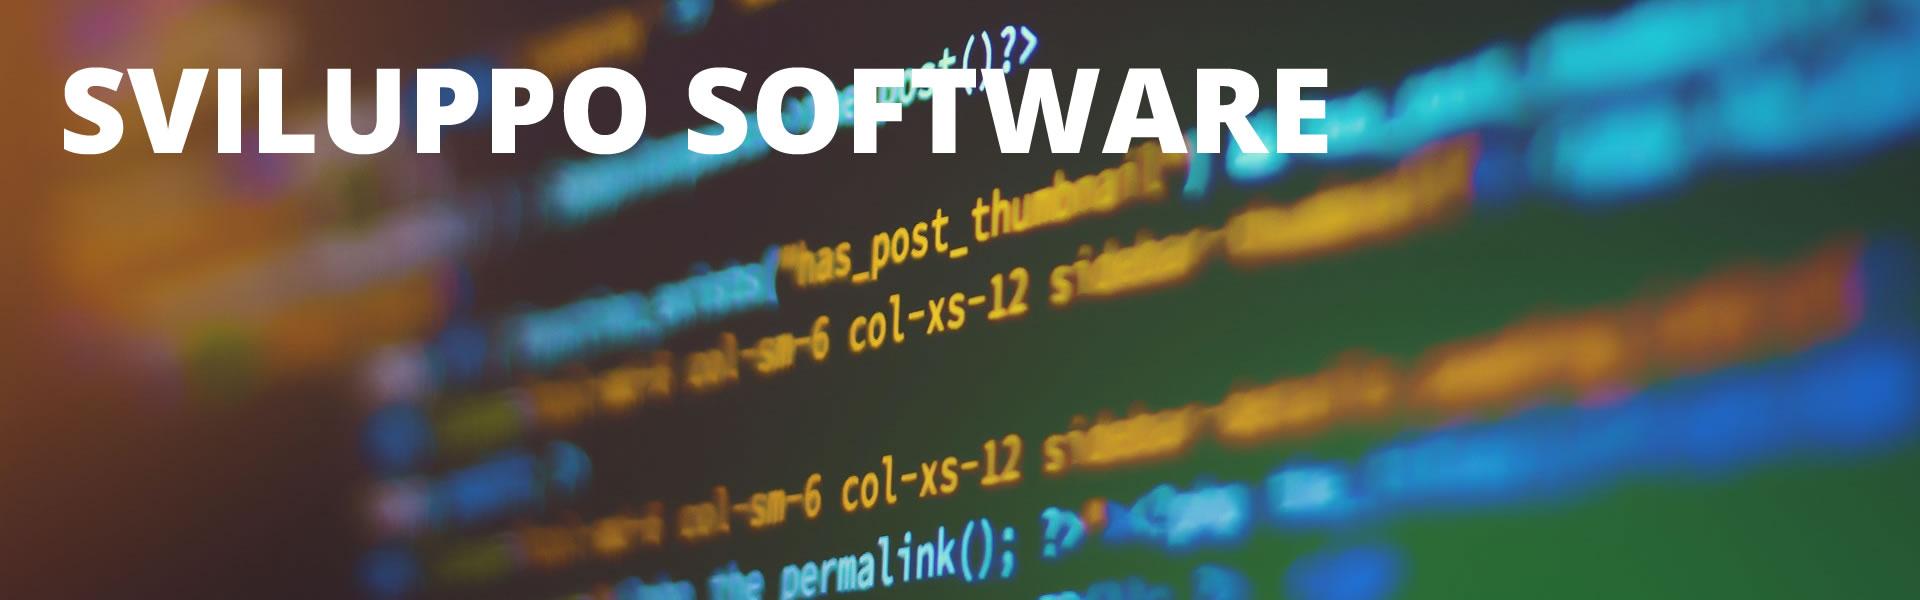 sviluppo-software